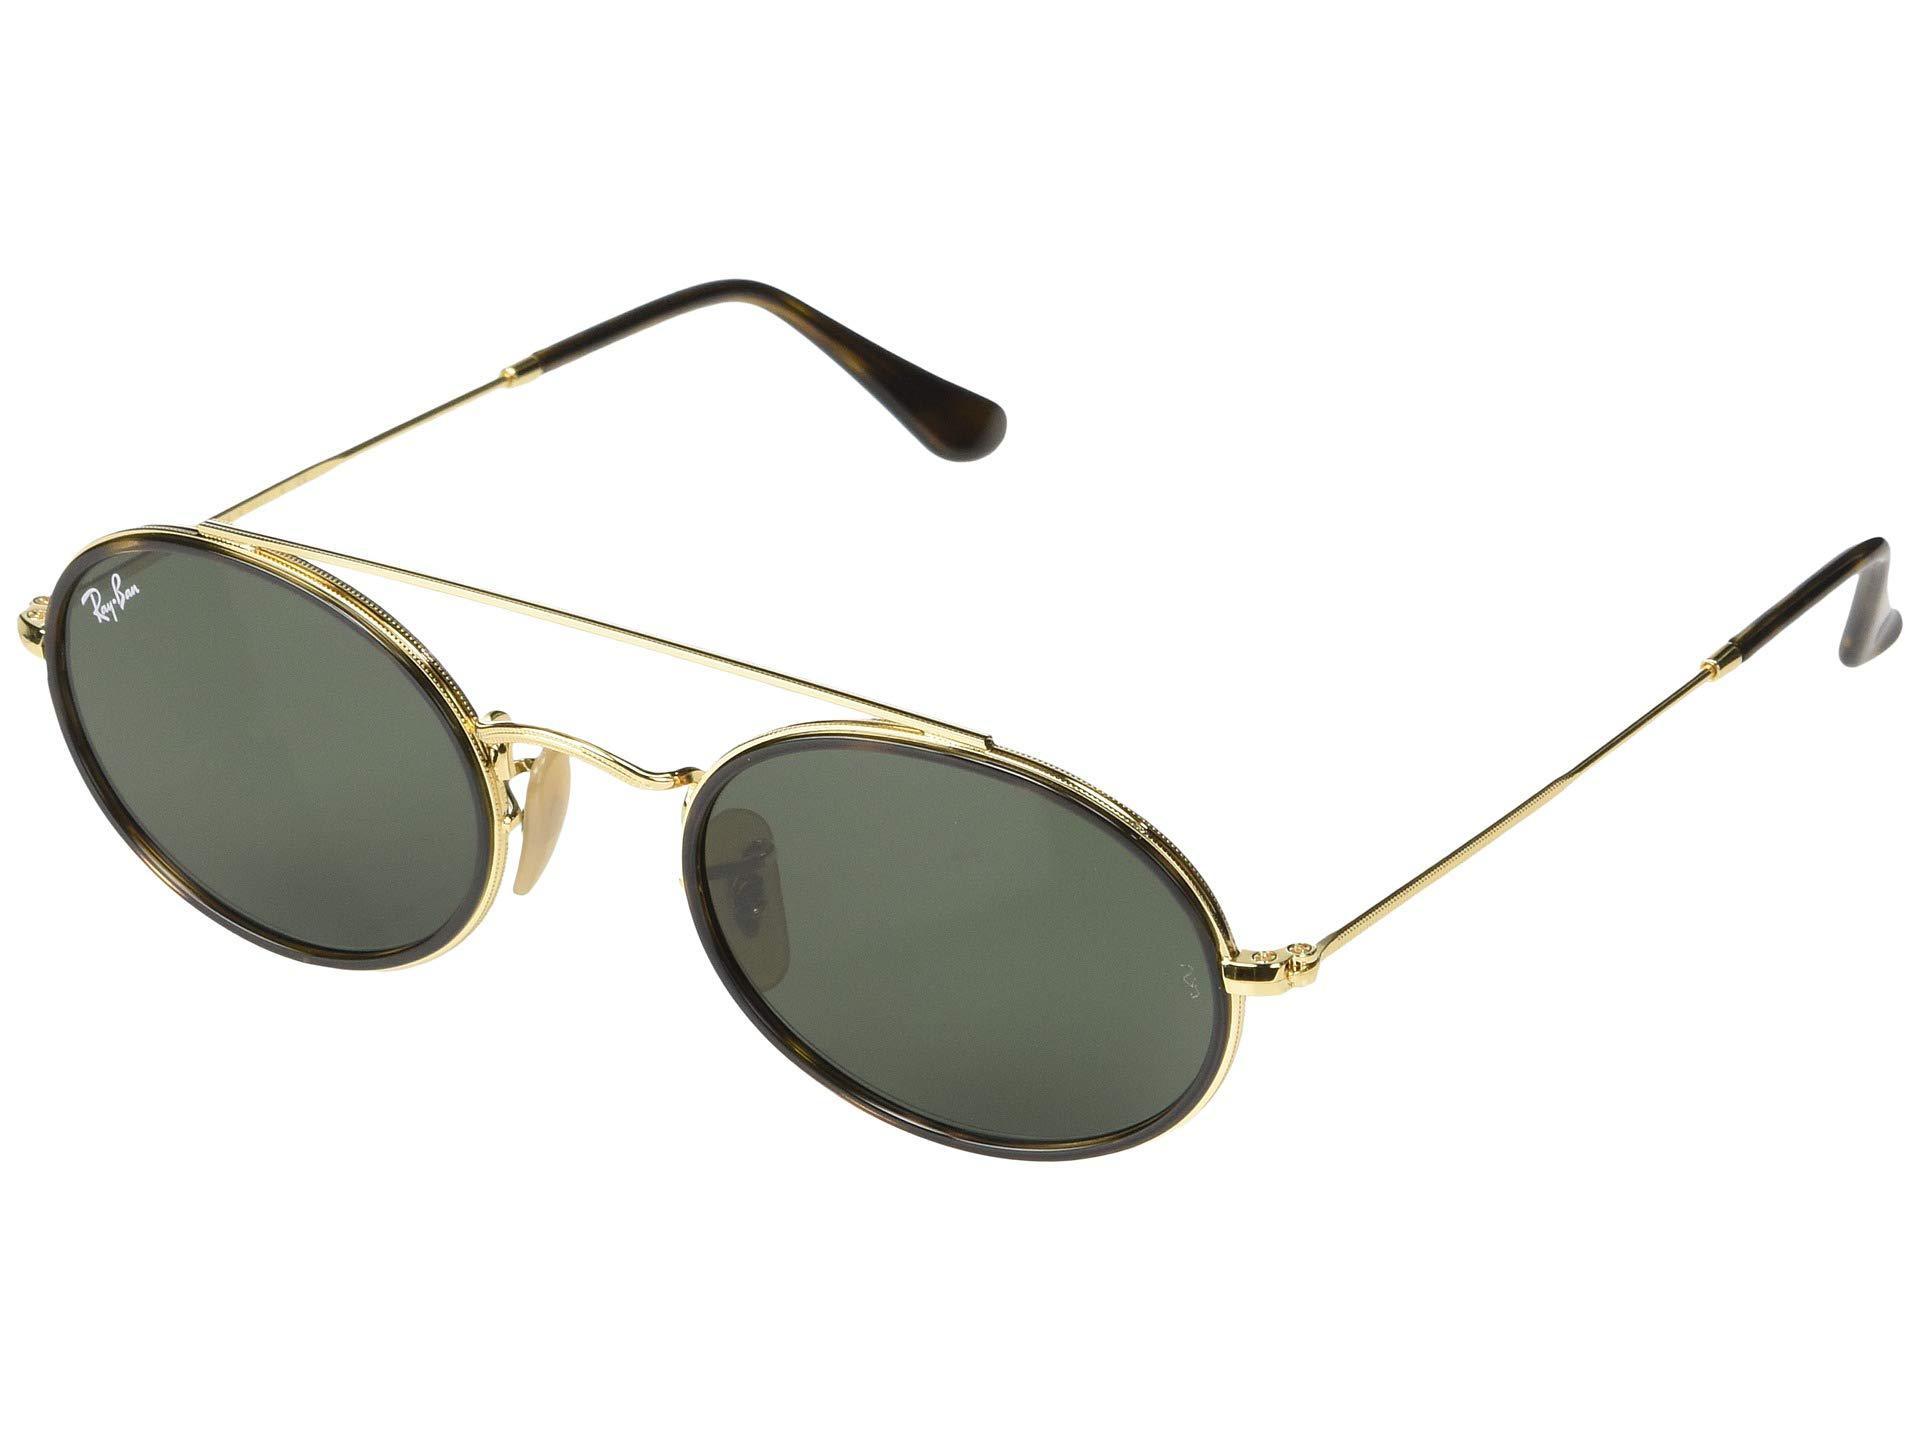 7ee25212b0 Ray-Ban. Women s Metallic Rb3847n 52 Mm. (gold blue Gradient) Fashion  Sunglasses